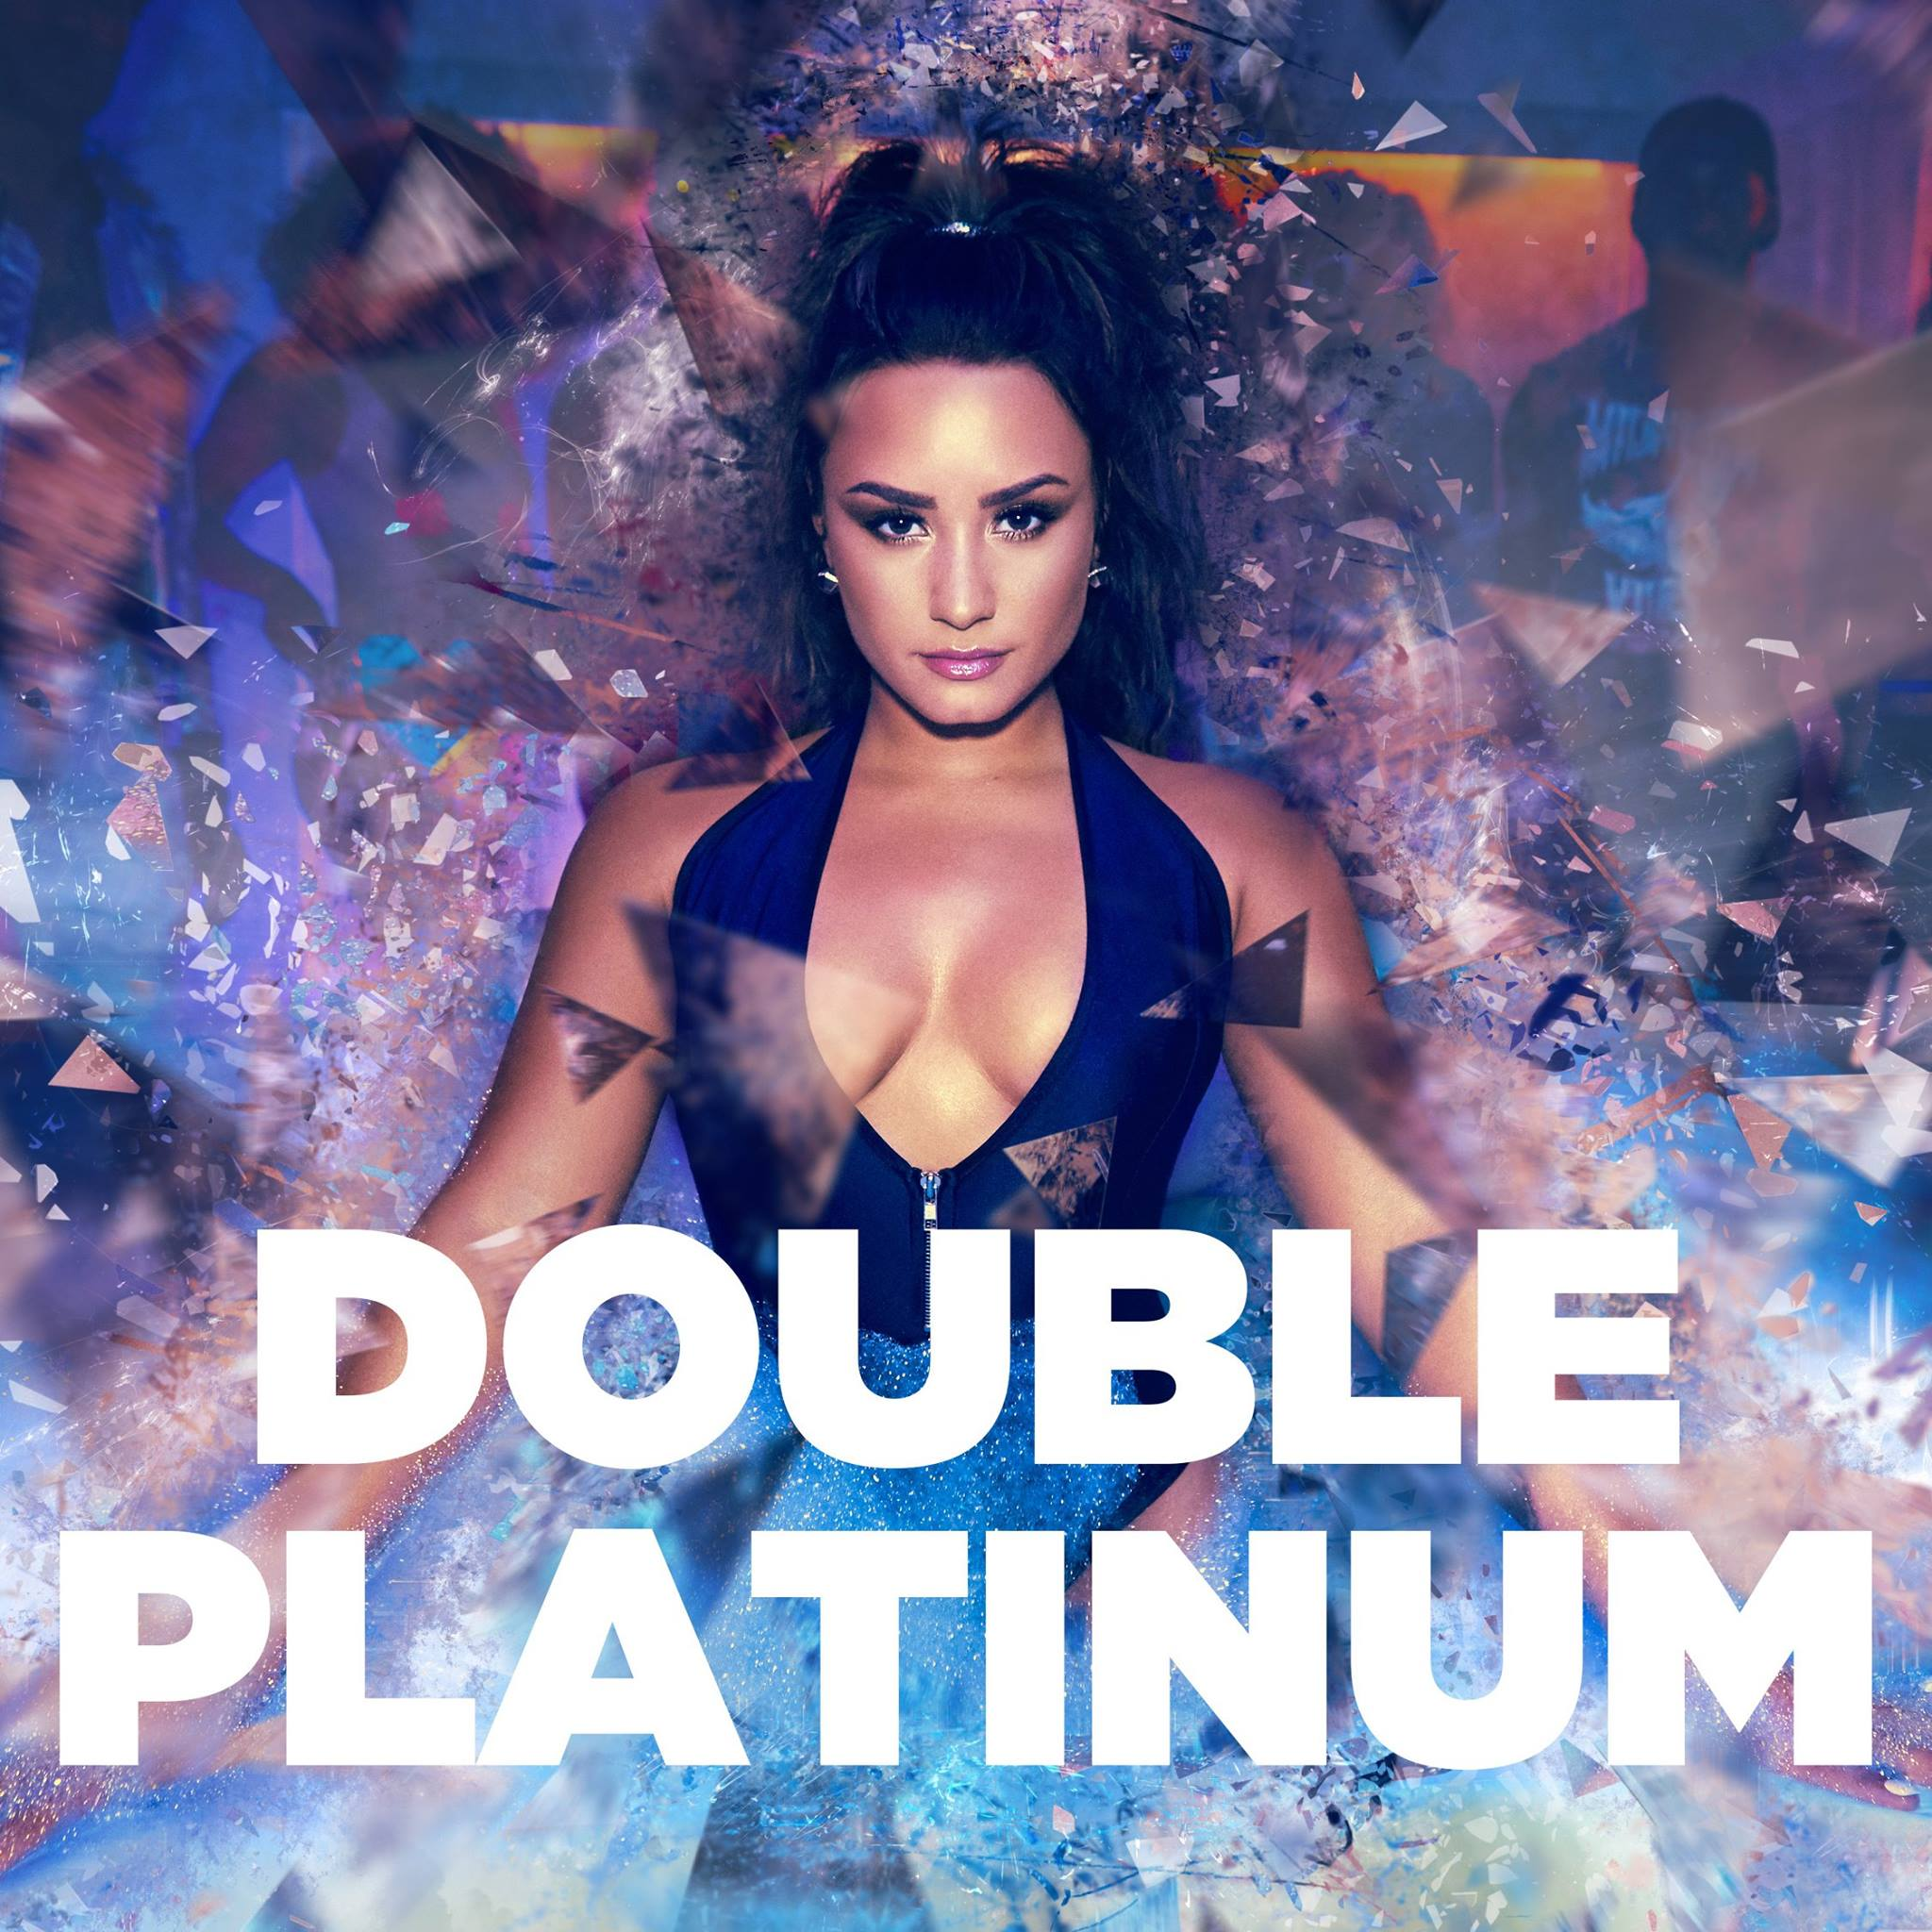 �� @ddlovato's #SORRYNOTSORRY is DOUBLE platinum!! Congrats girl! https://t.co/oe8CP3k7sA